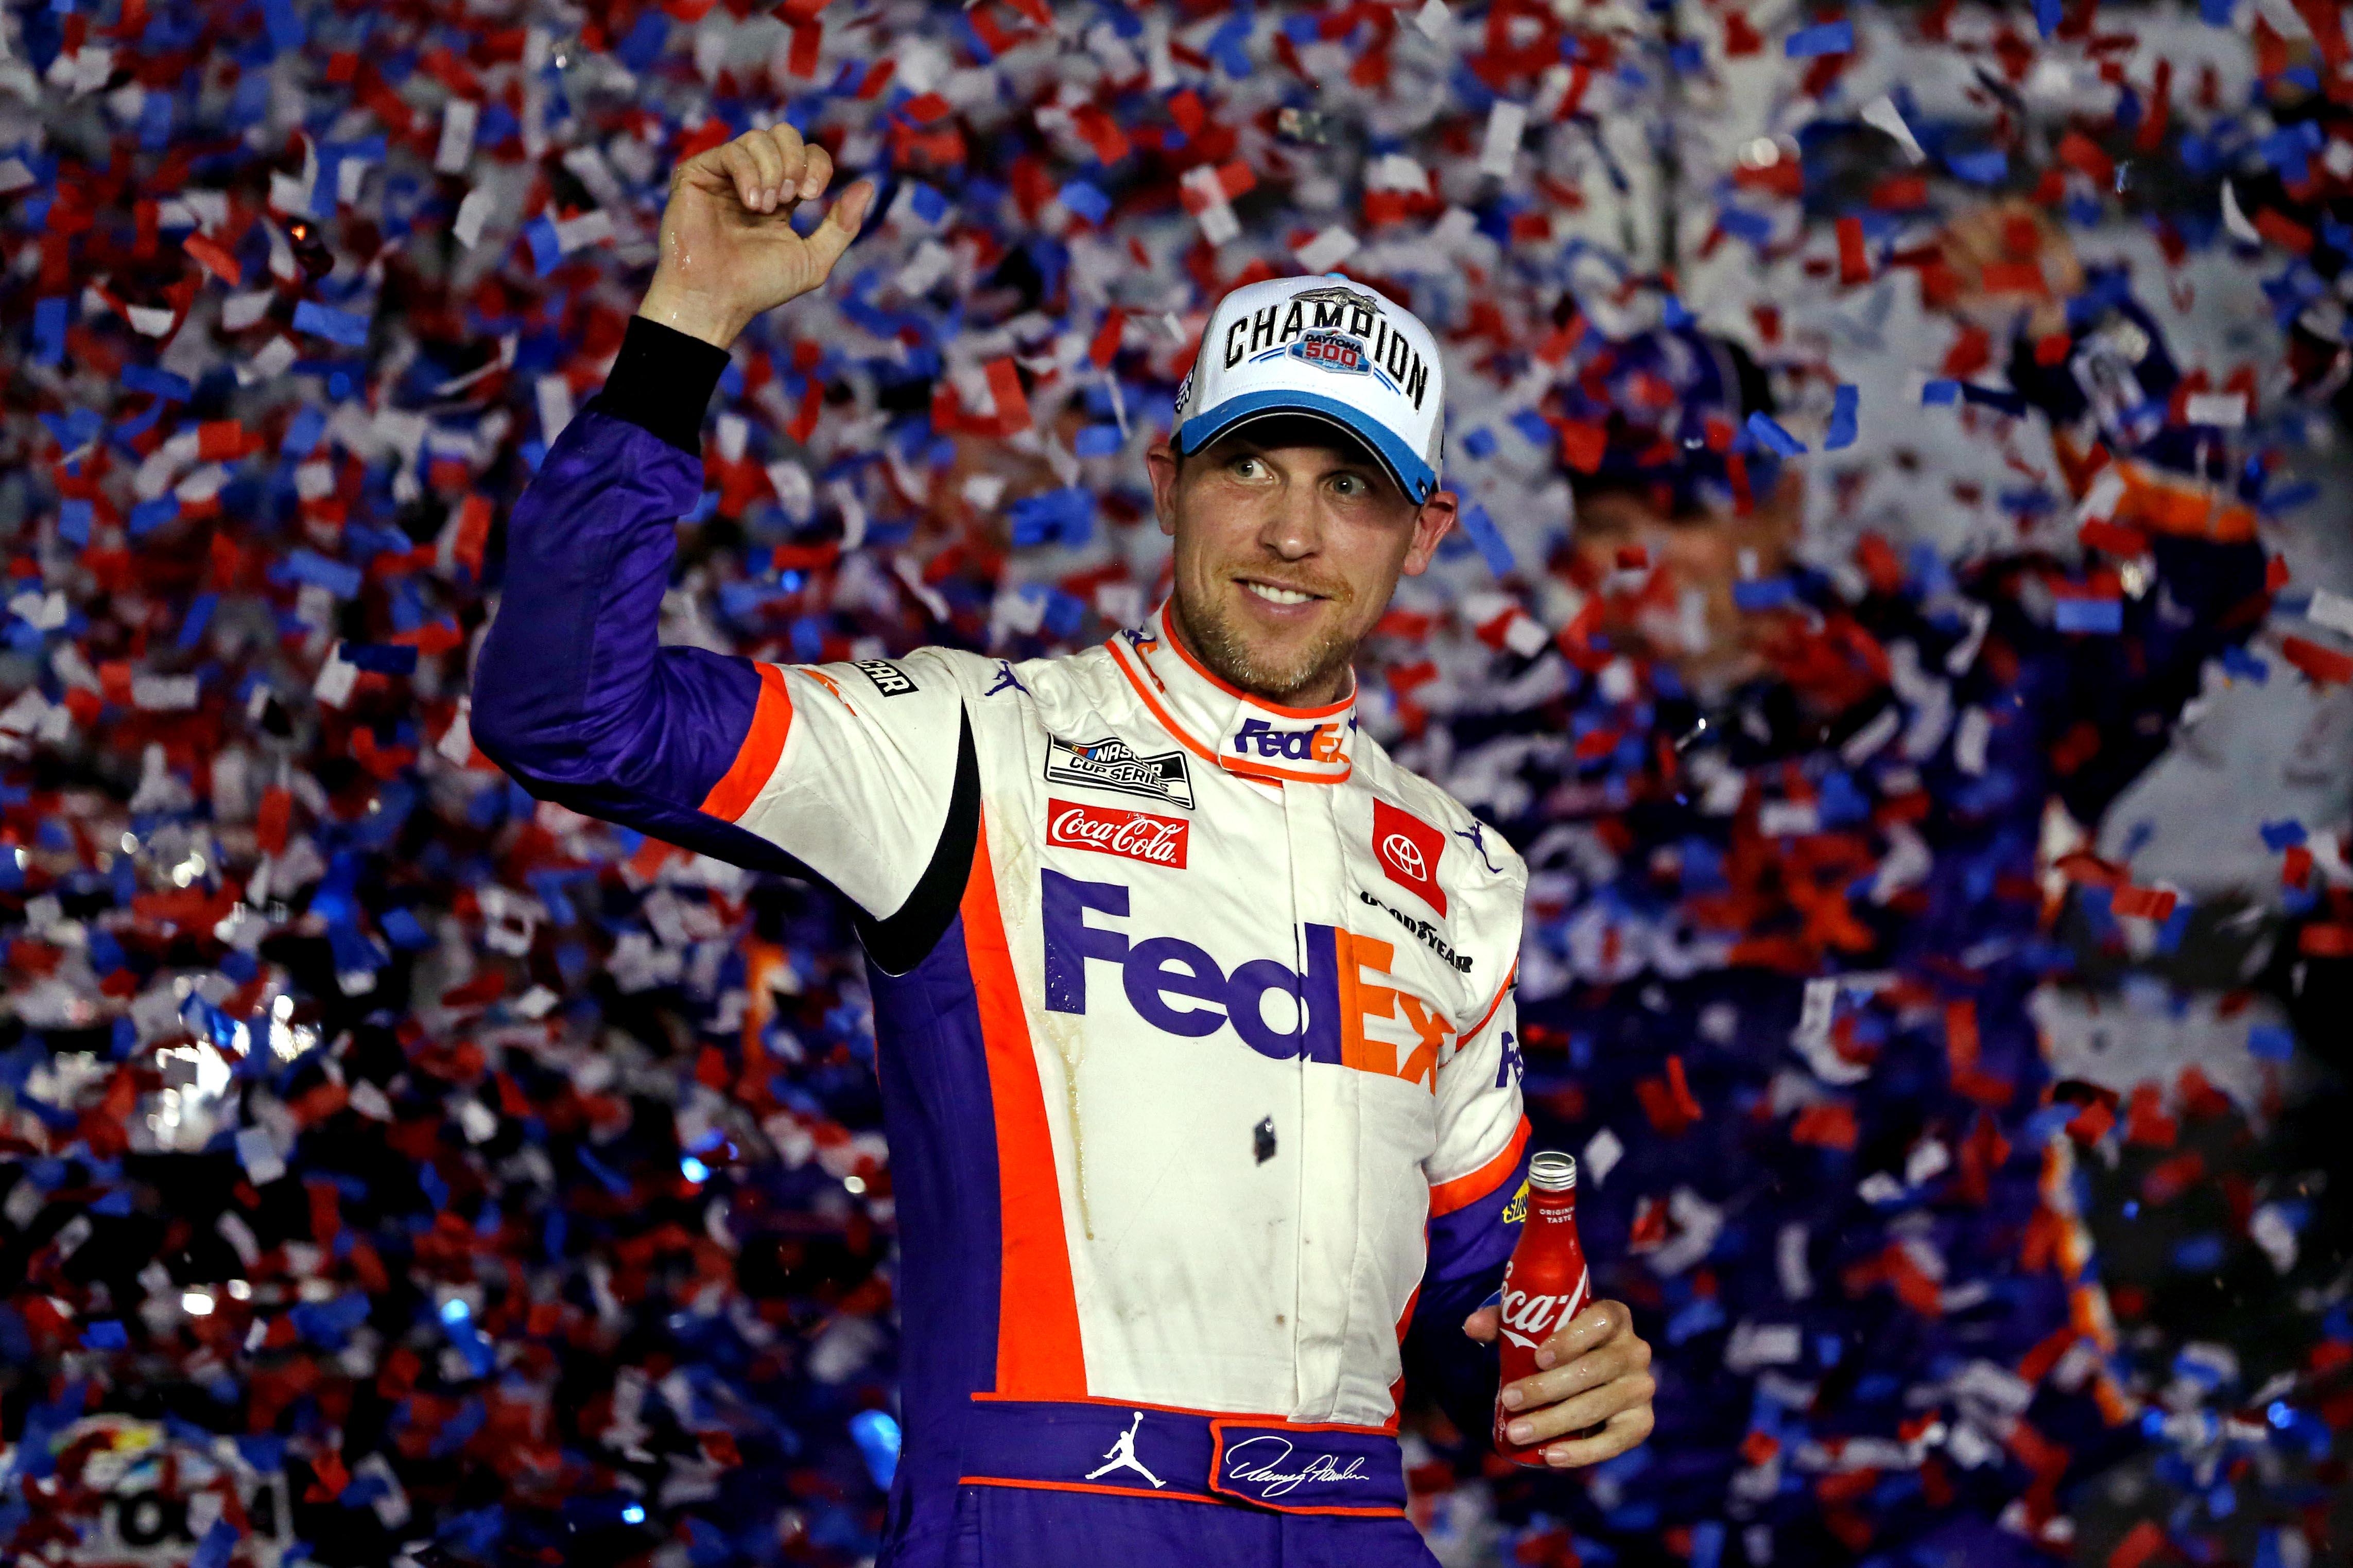 Denny Hamlin wins second closest Daytona 500 of all-time